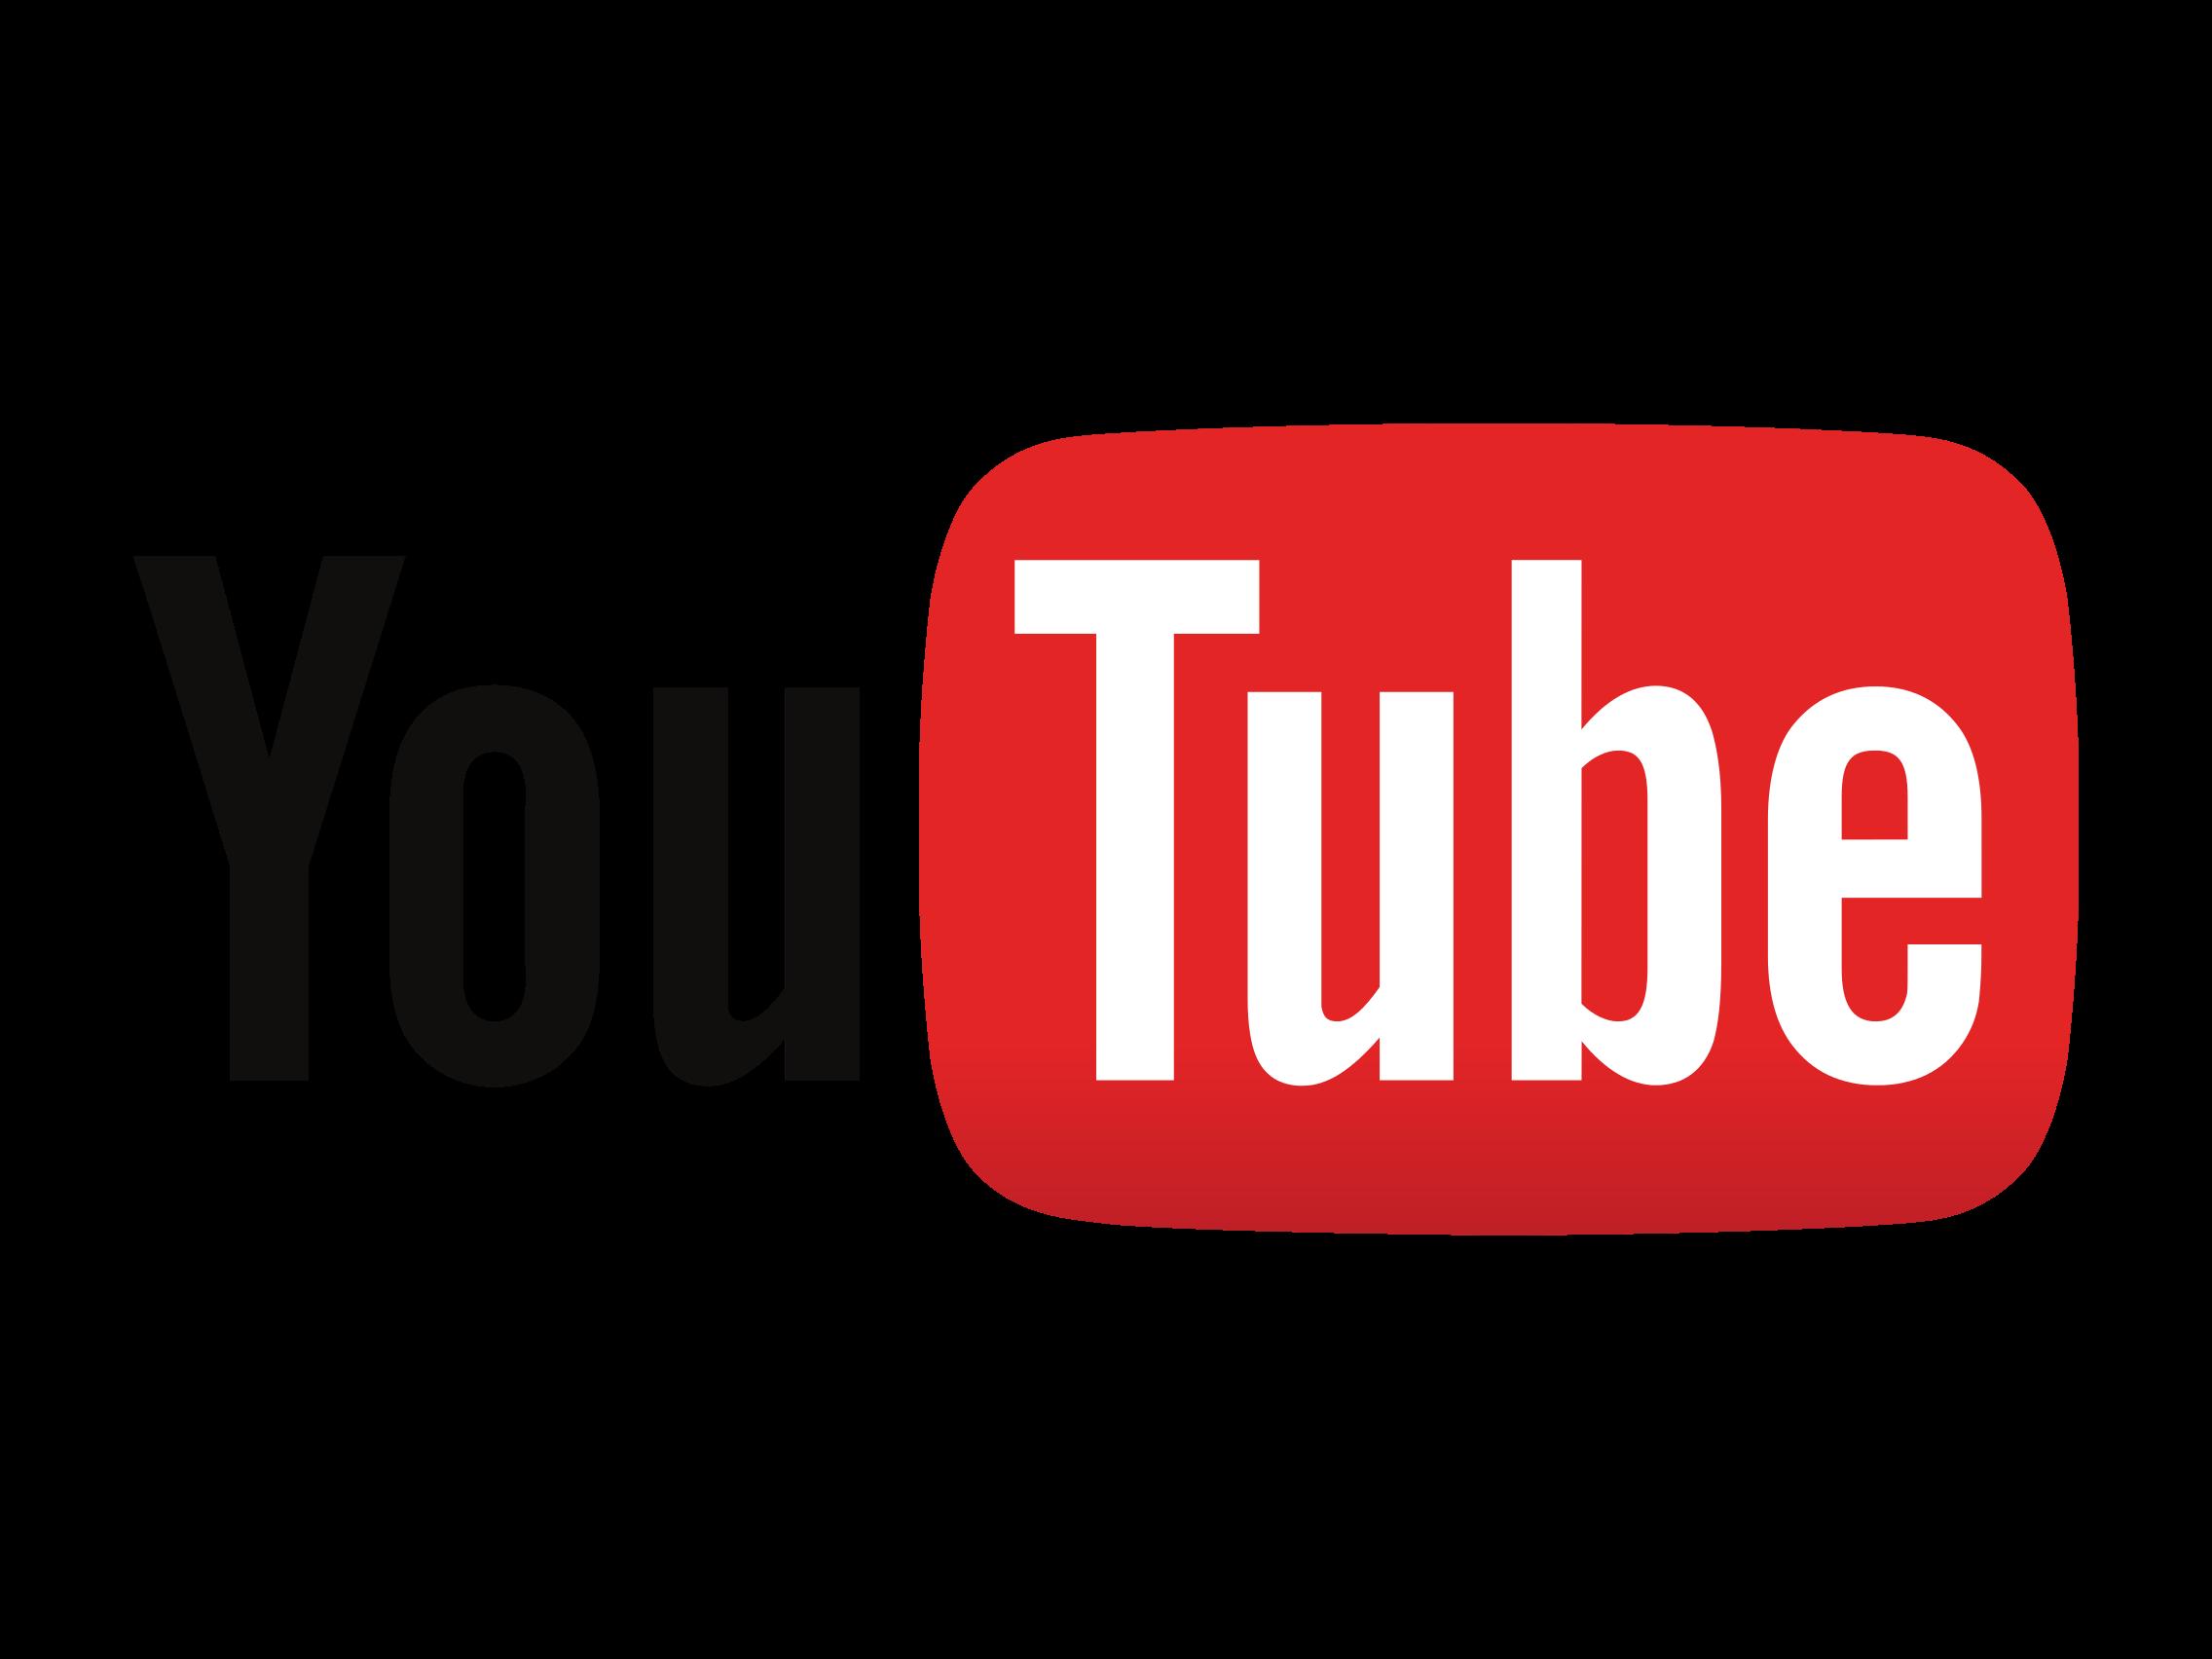 Video marketing advertising logo